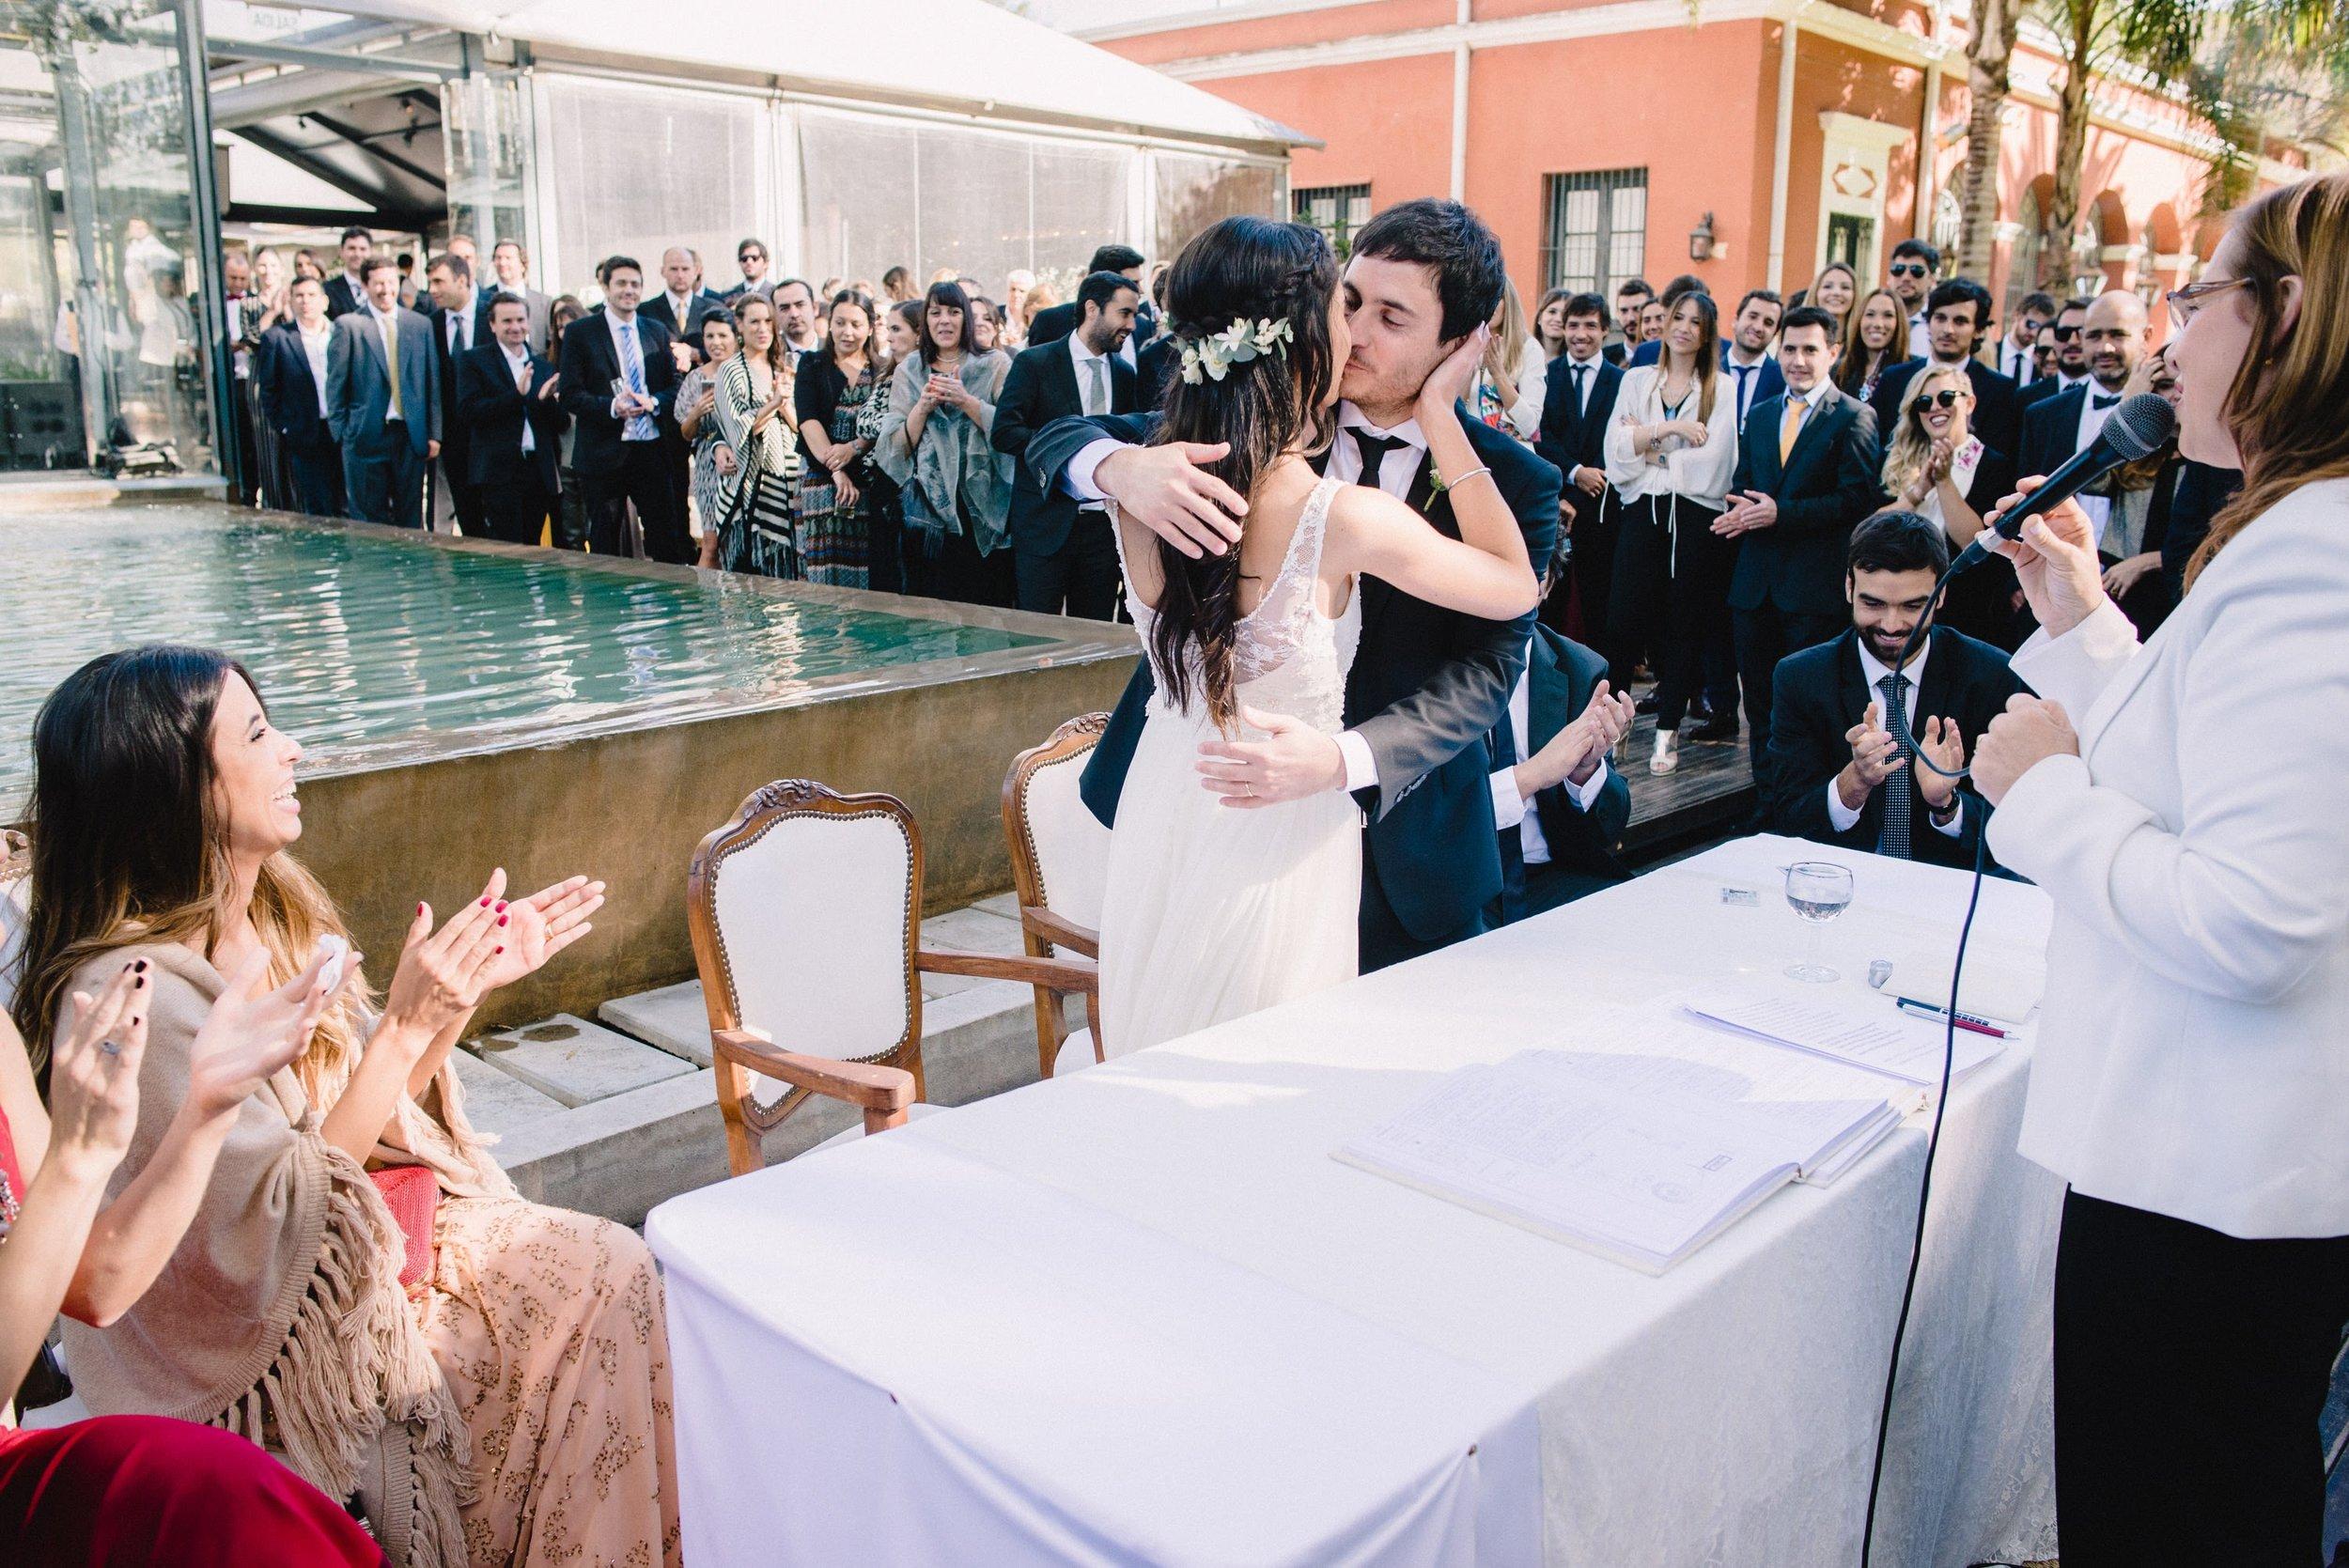 fotografo de bodas en carlos paz cordoba 057.JPG